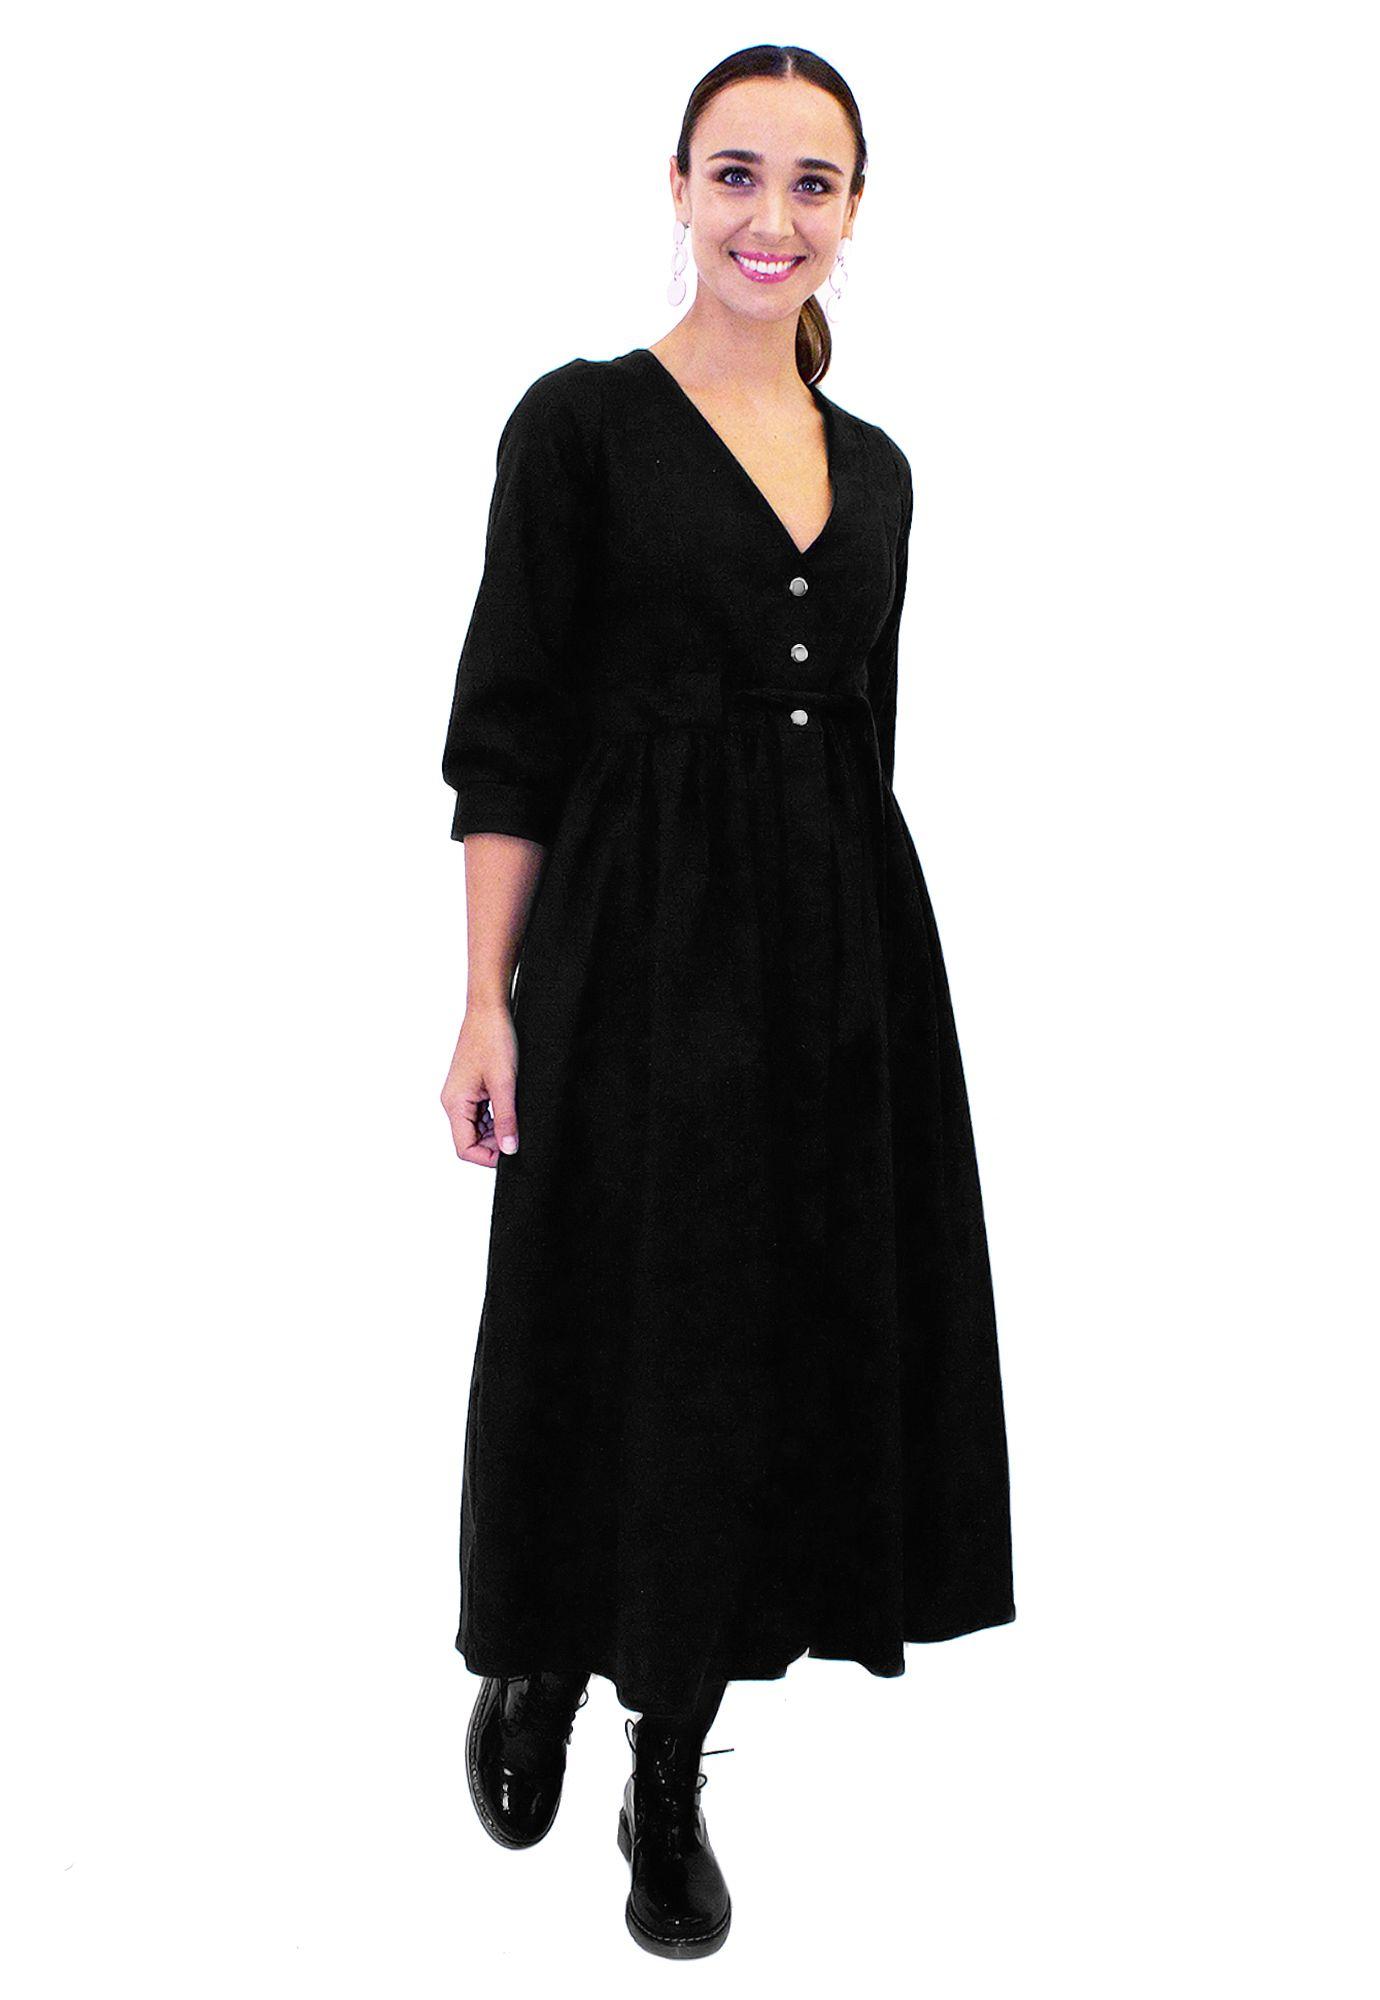 Vestido Largo Negro Largo Vestido Basico Negro Basico Vestido L4ARj5